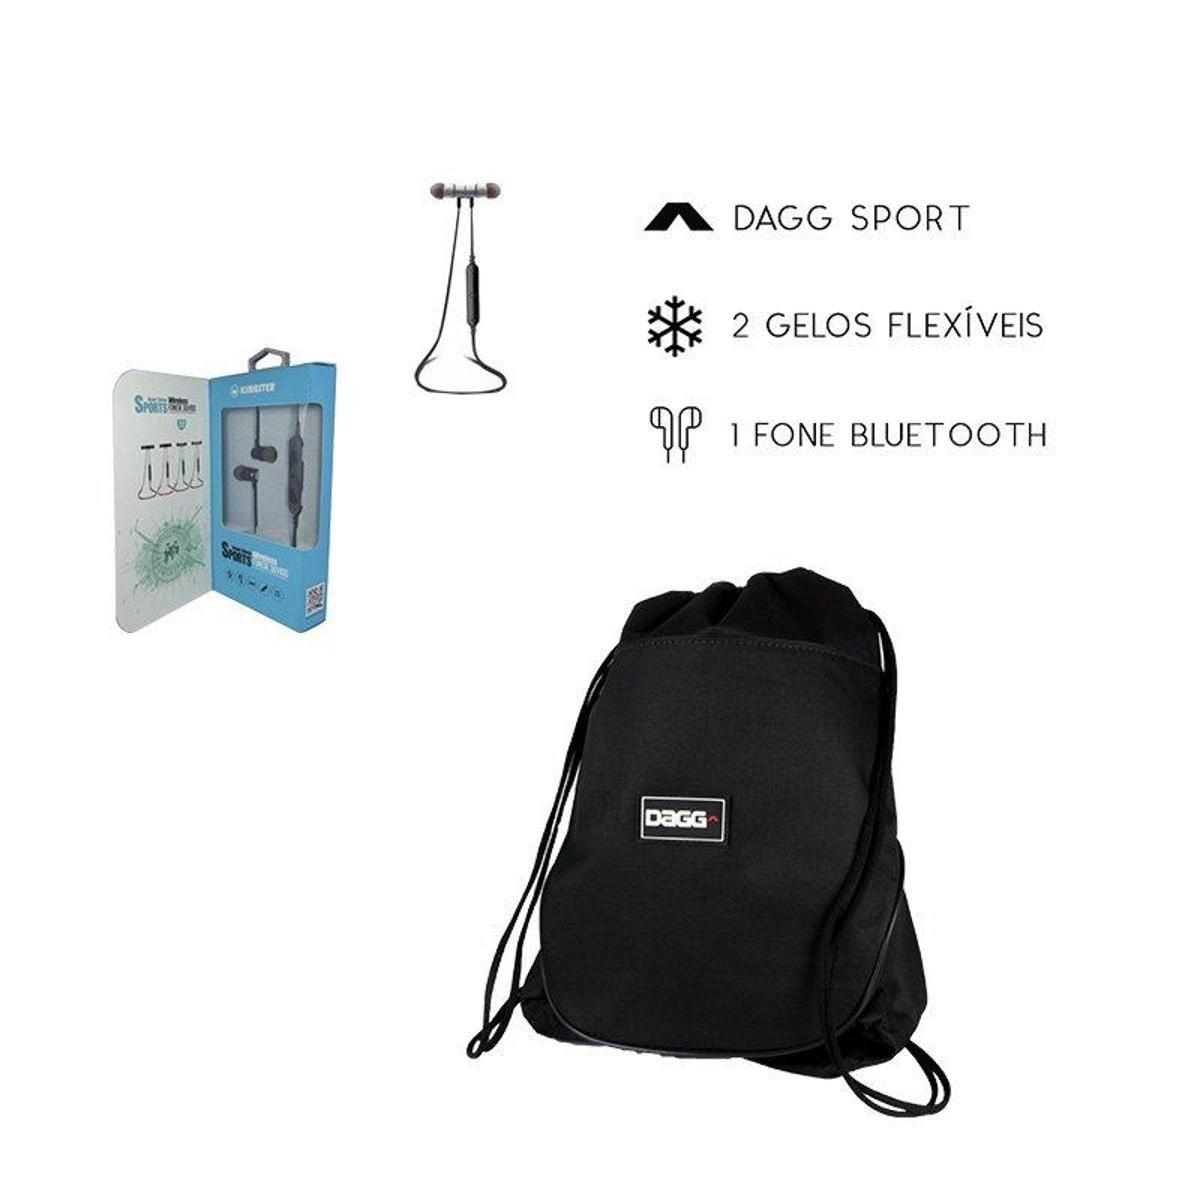 f85431d47 Kit Mochila Térmica e Fone Bluetooth - Preto - Compre Agora | Netshoes